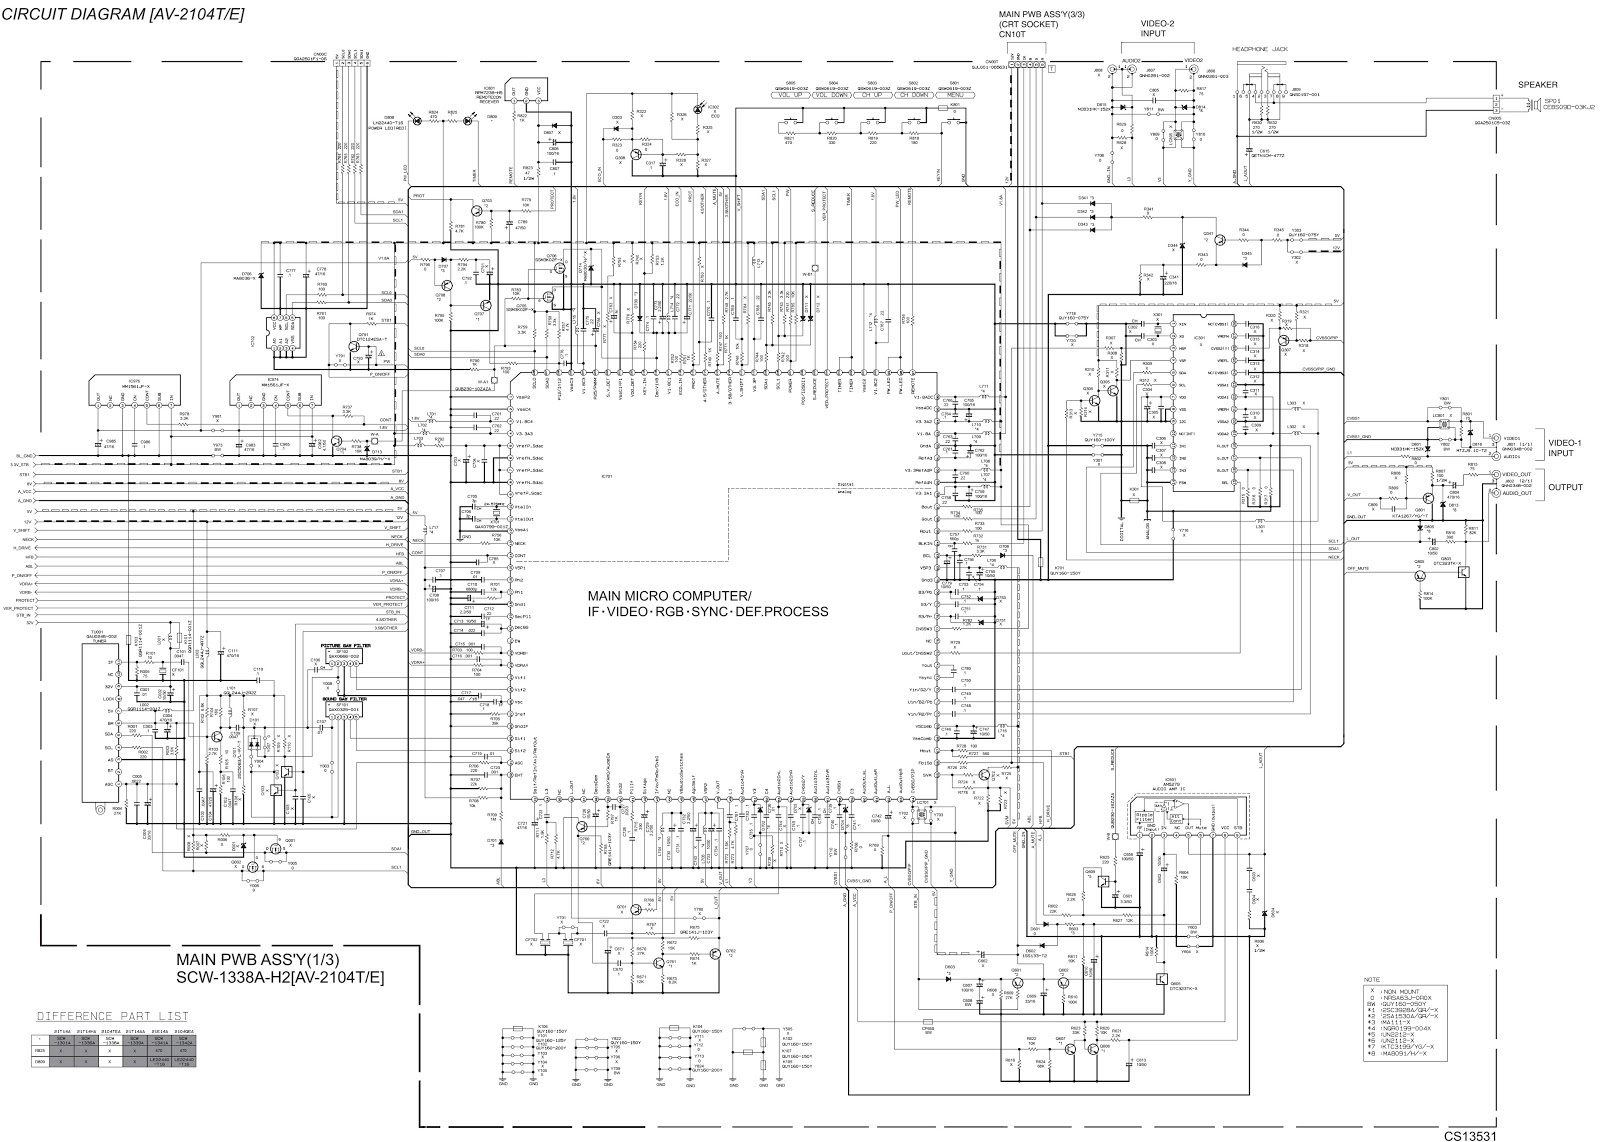 jvc av21tmg4 u2013 jvc av2104t u2013 crt tv u2013 circuit diagram u2013 [ 1600 x 1142 Pixel ]